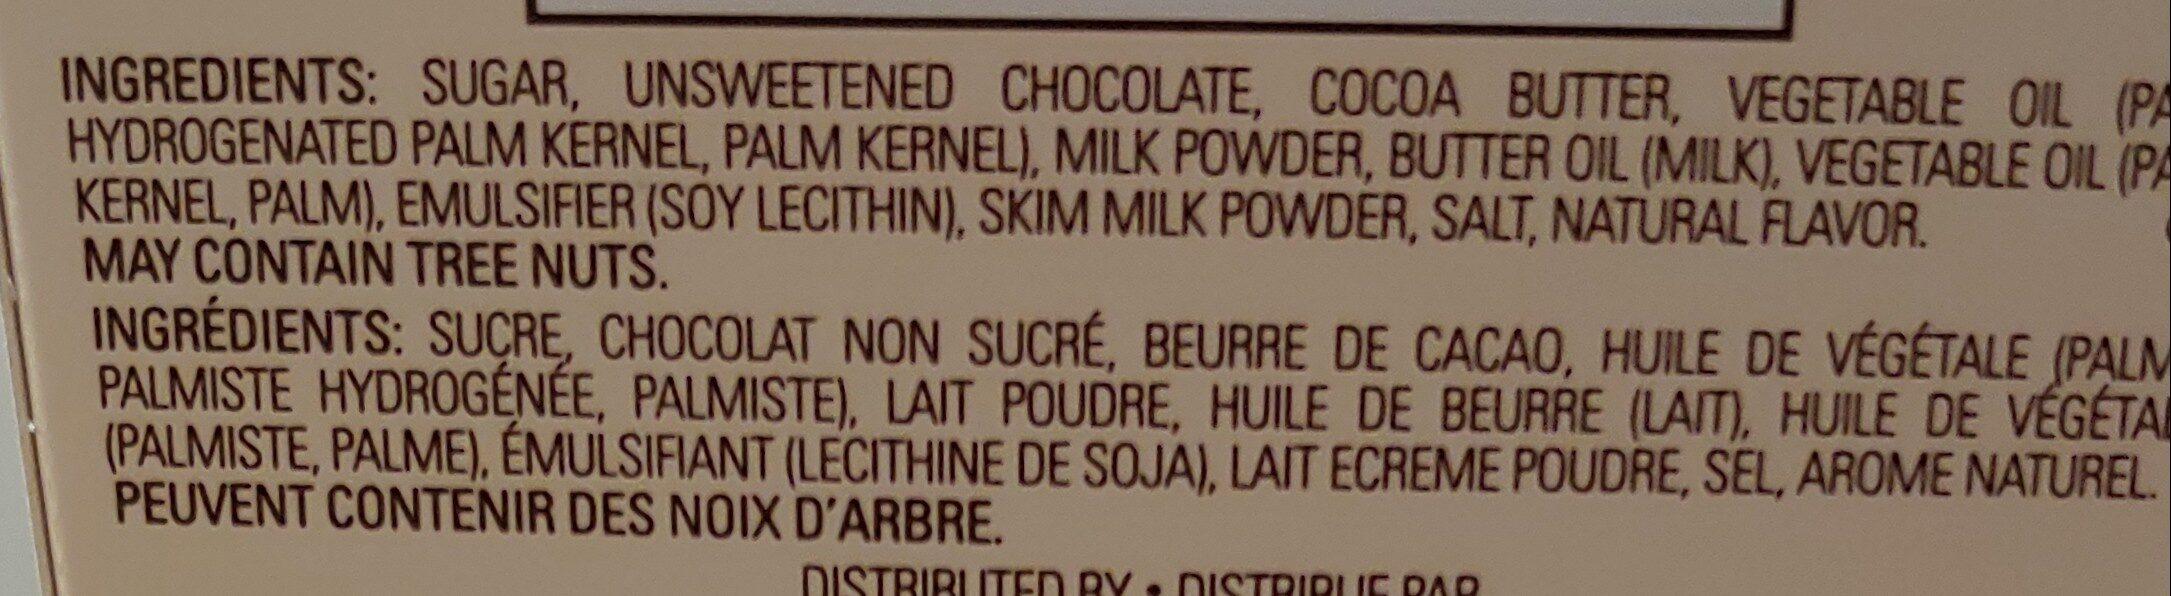 godiva chocolates - Ingredients - en